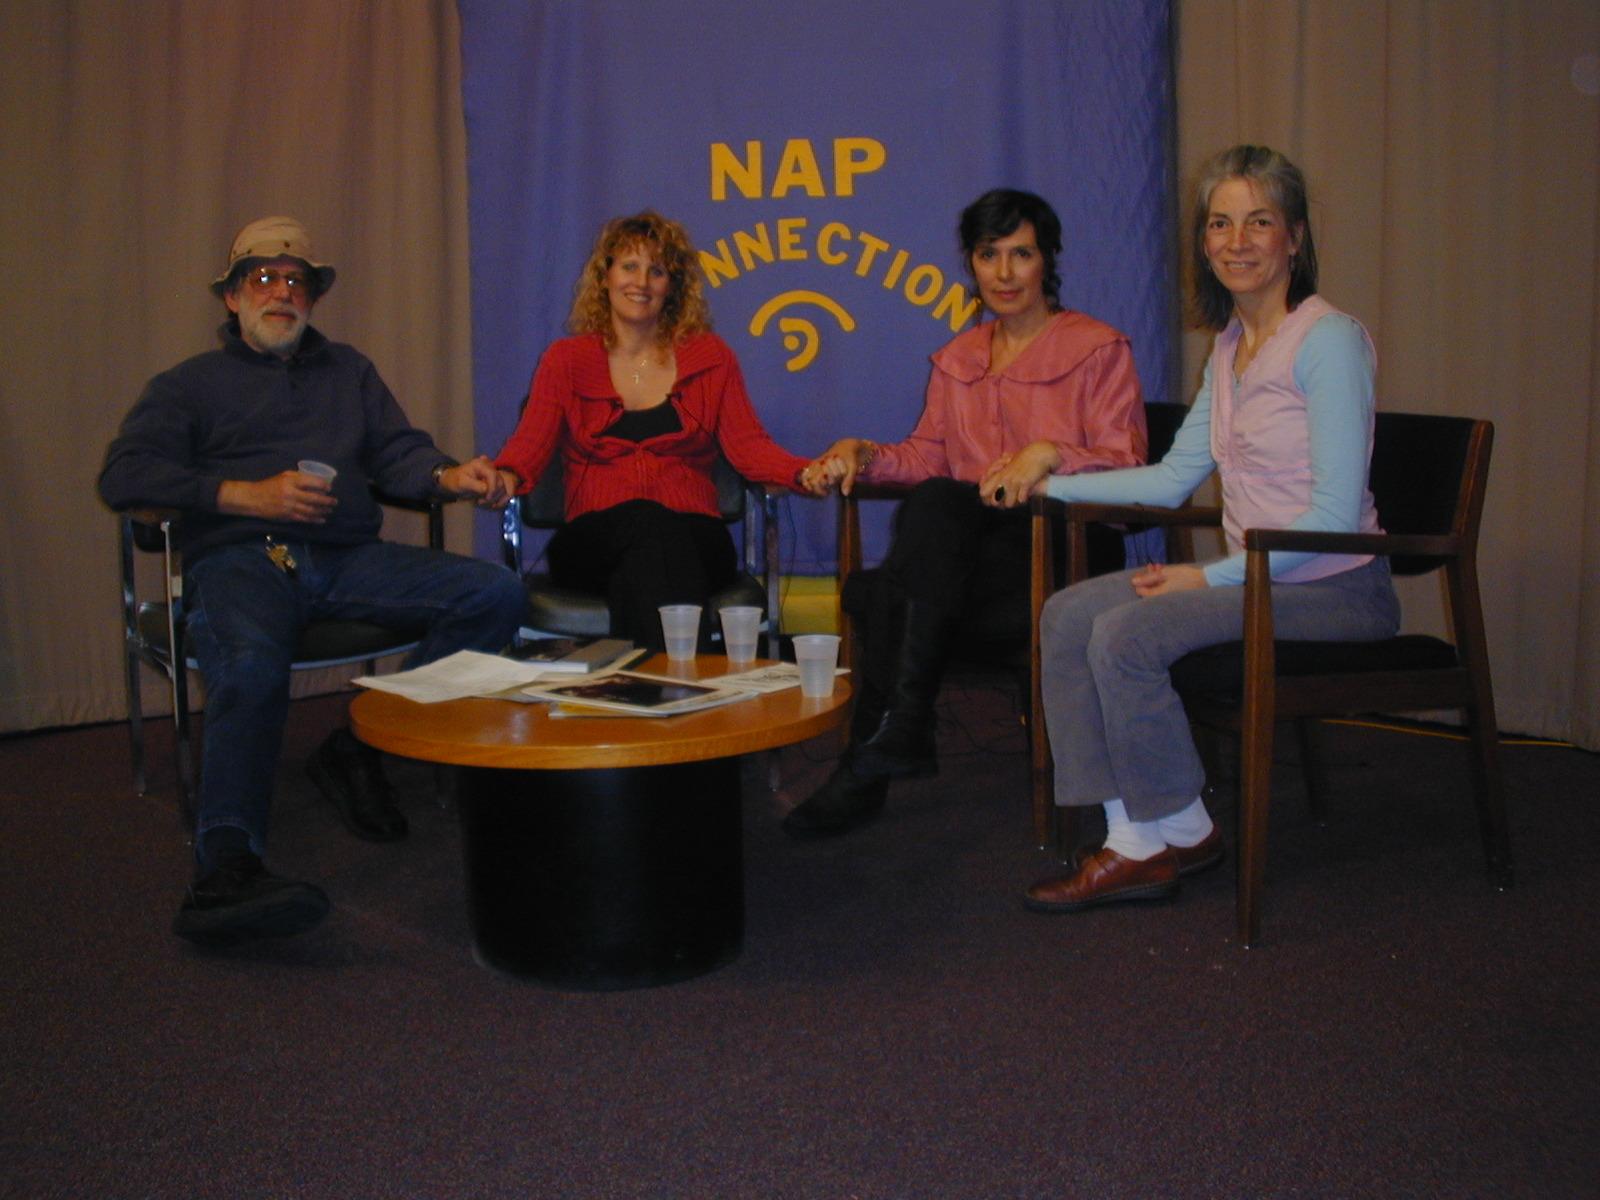 NAP New Arts Program Kutztown PA jan 05 holding hands.JPG